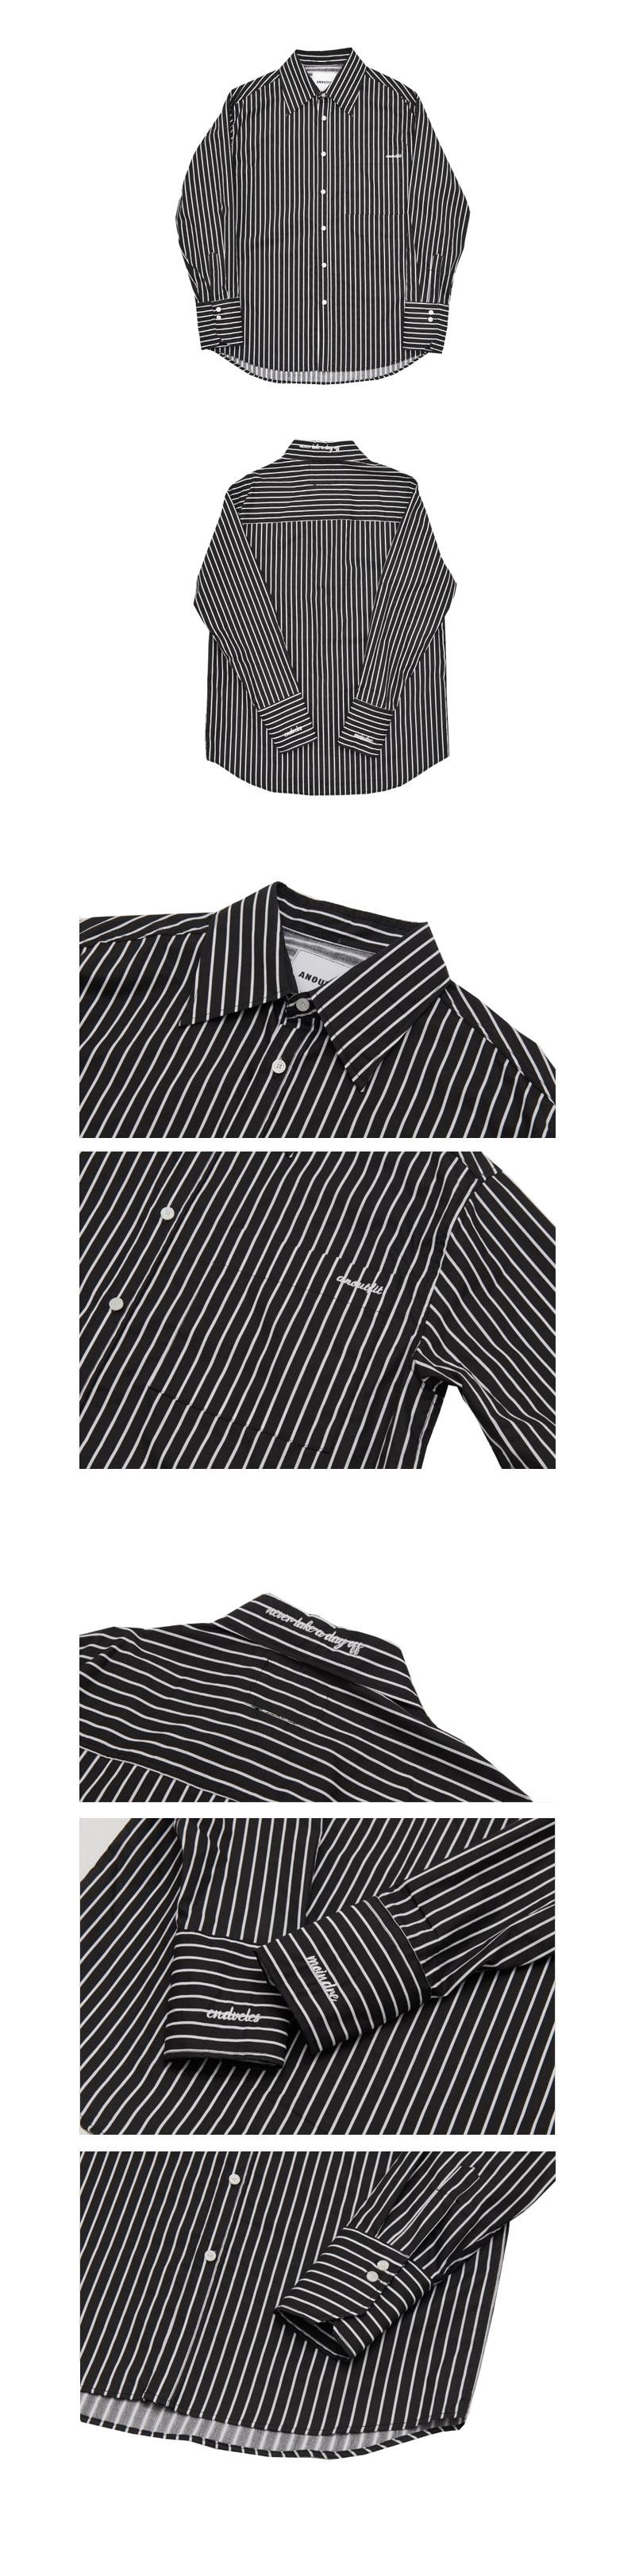 29_BLACK_DETAIL.jpg